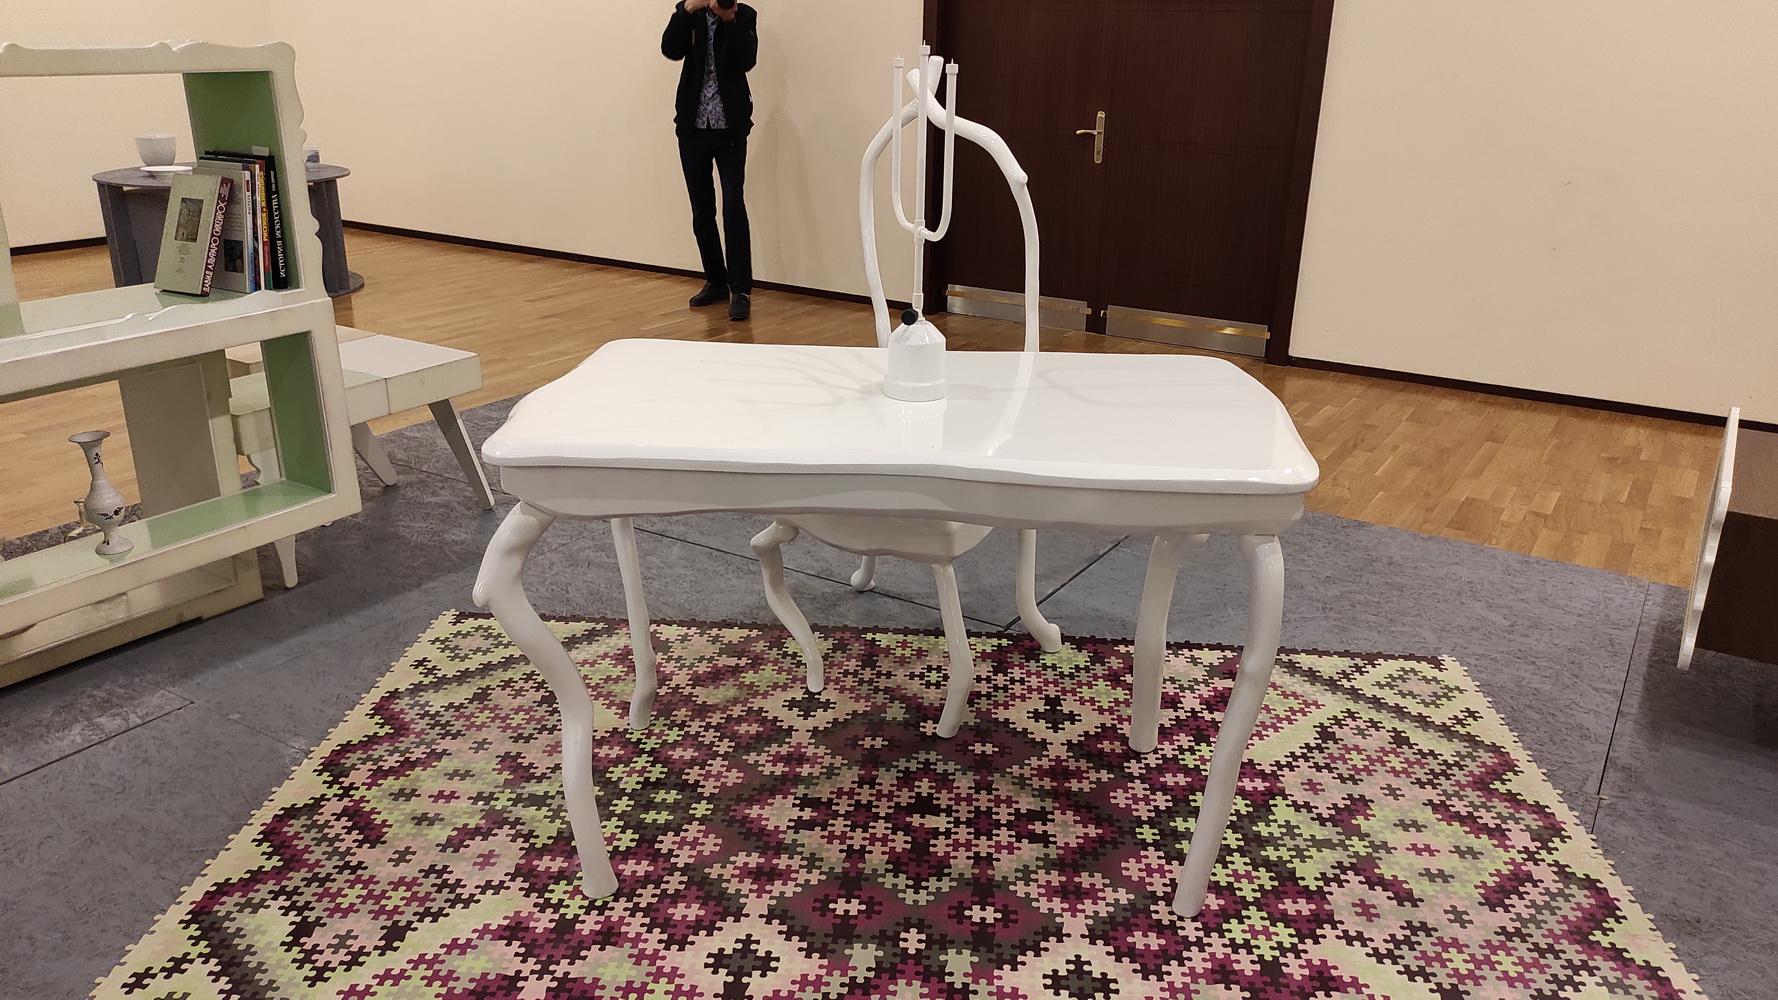 Ева Маркверре NIDO Серия столов и табуреток 2008